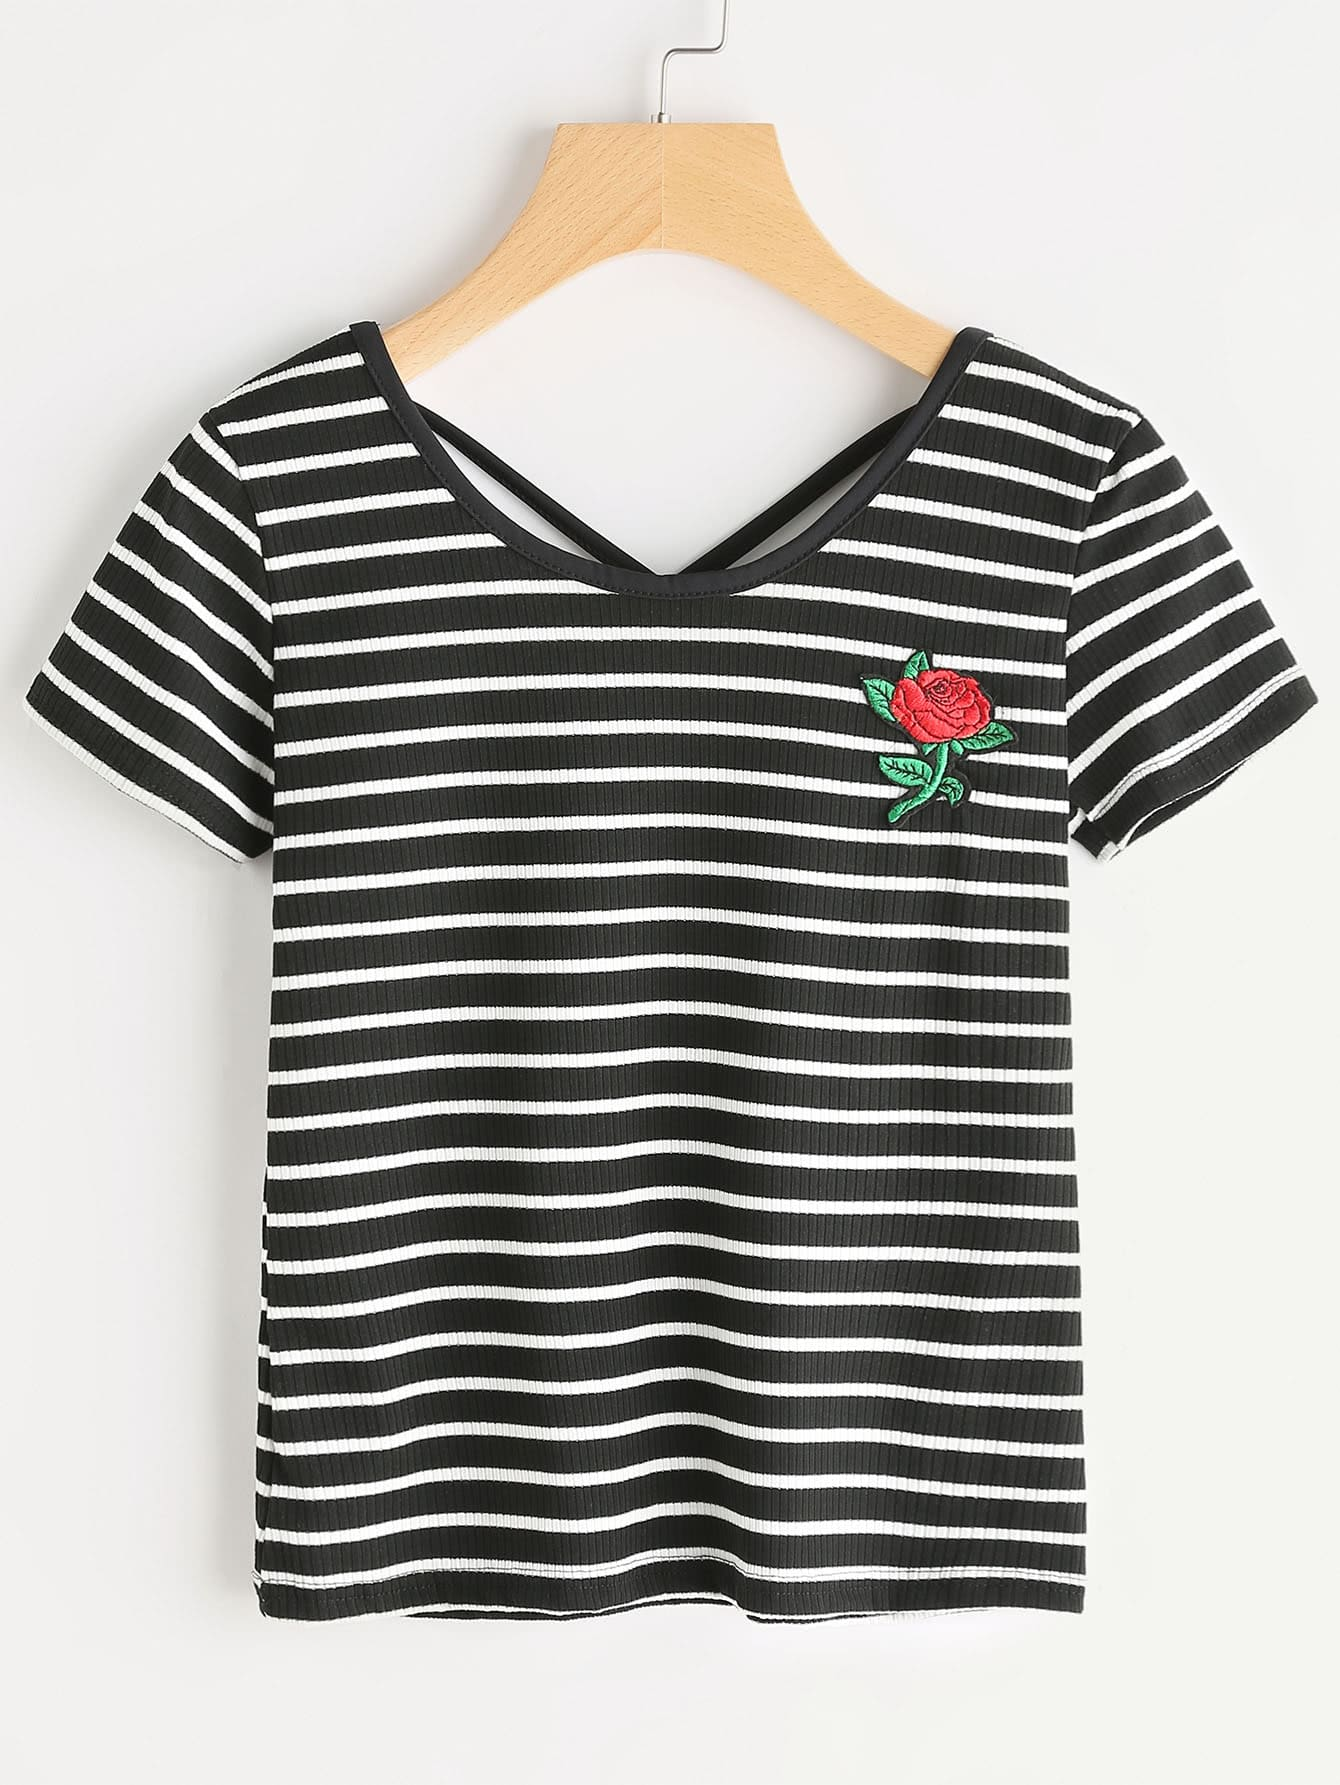 Striped Rose Patch Criss Cross Back Tshirt